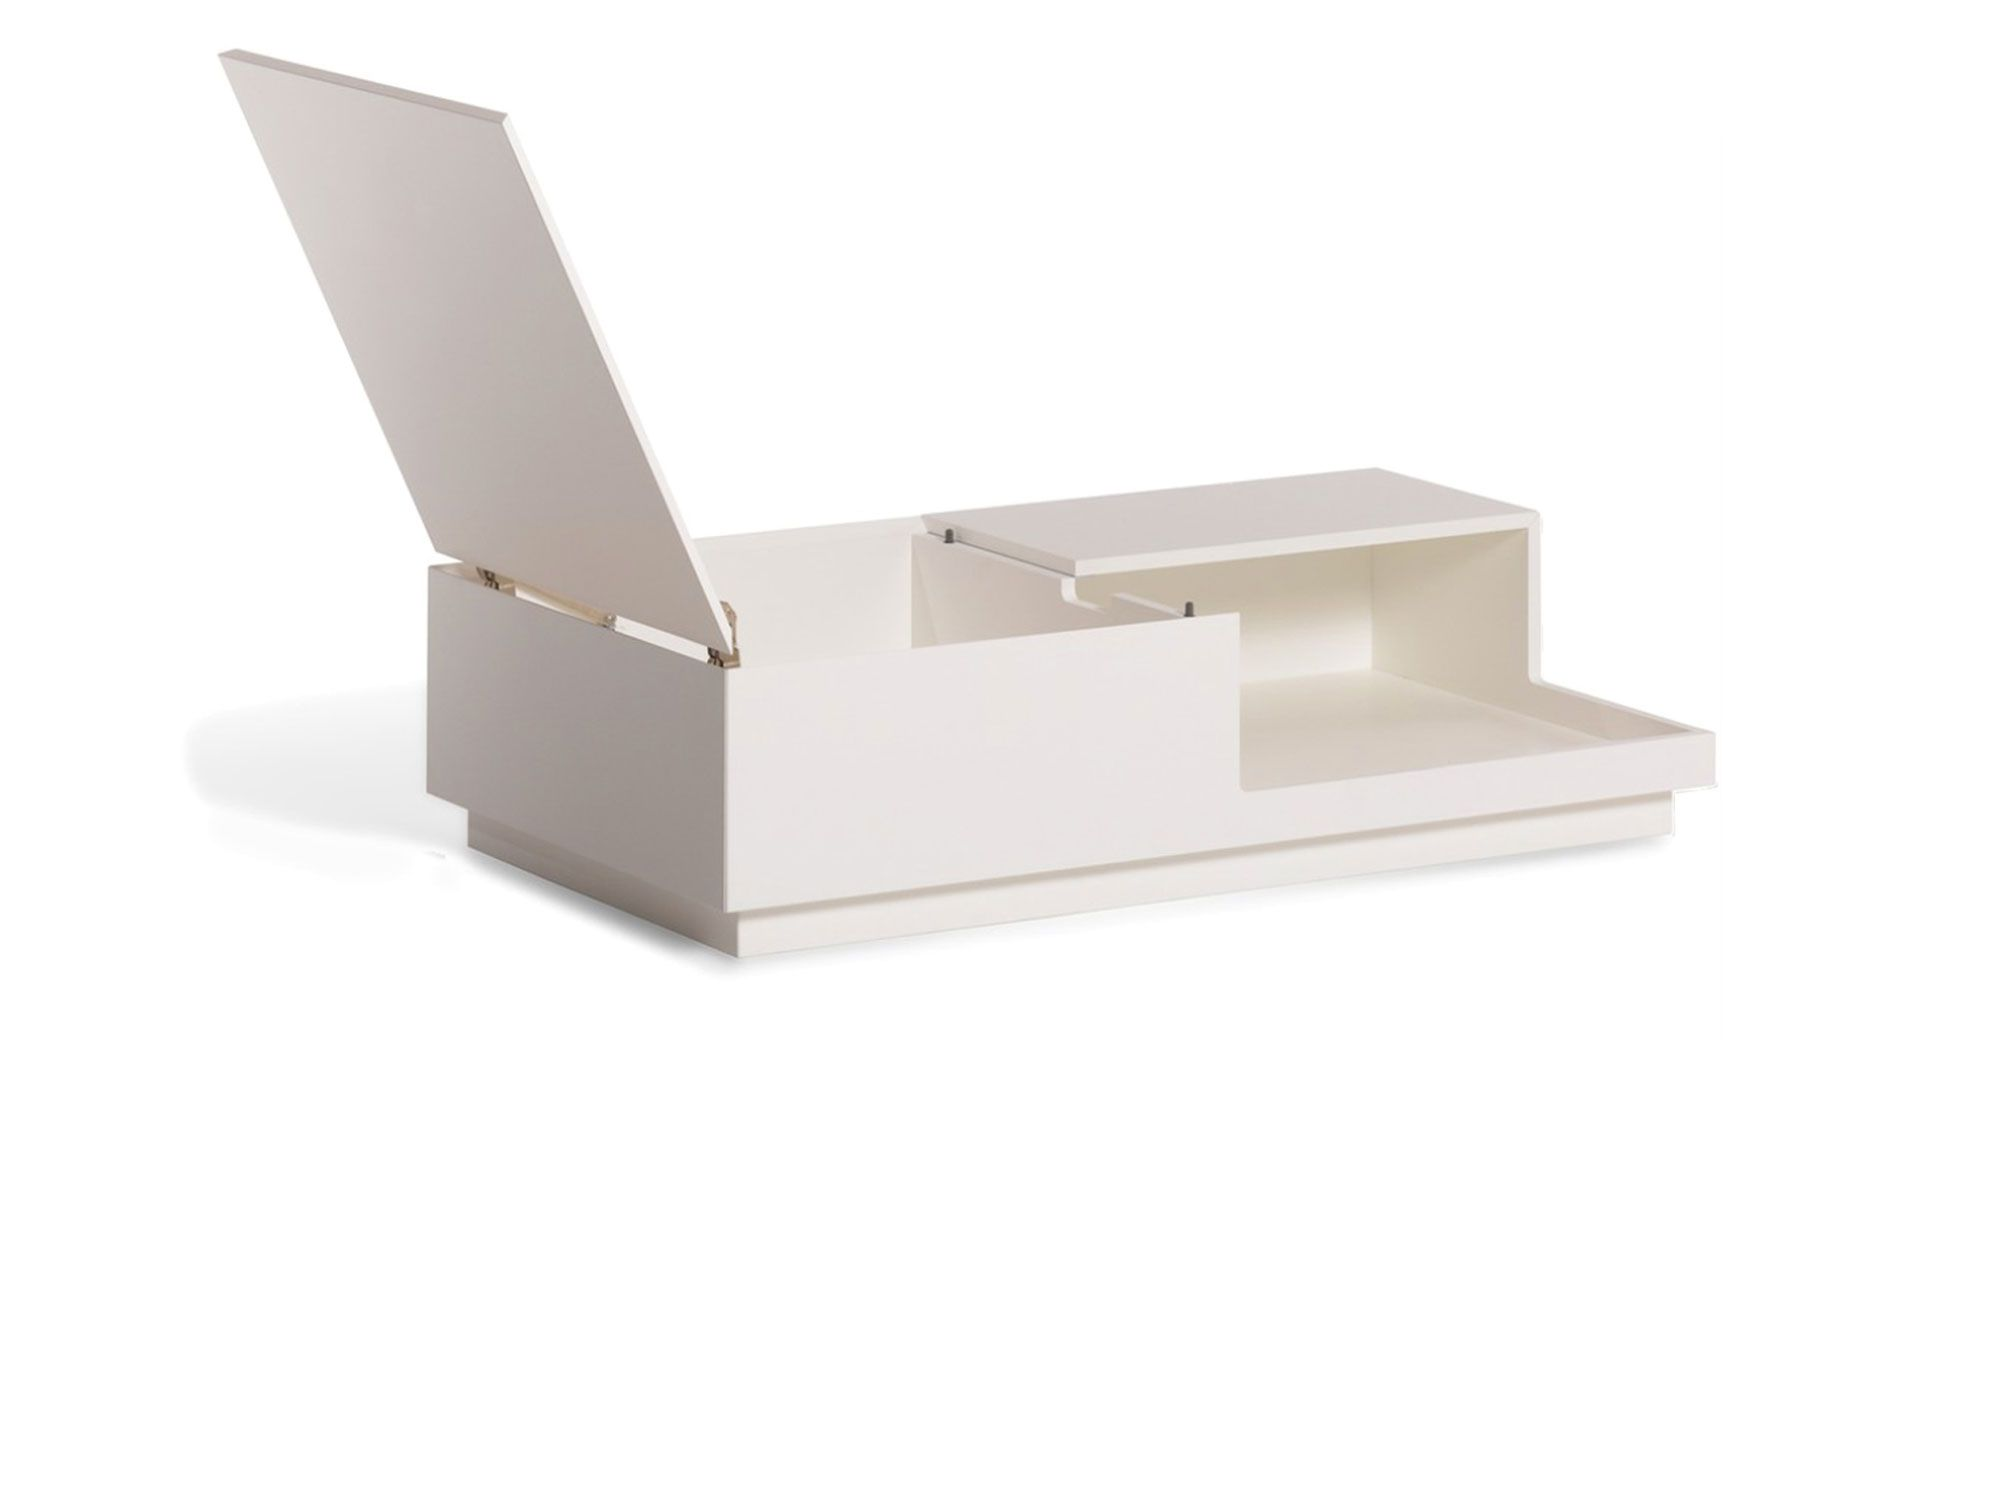 Le Industrial Design nicolas le moigne industrial designer designer nicolas le